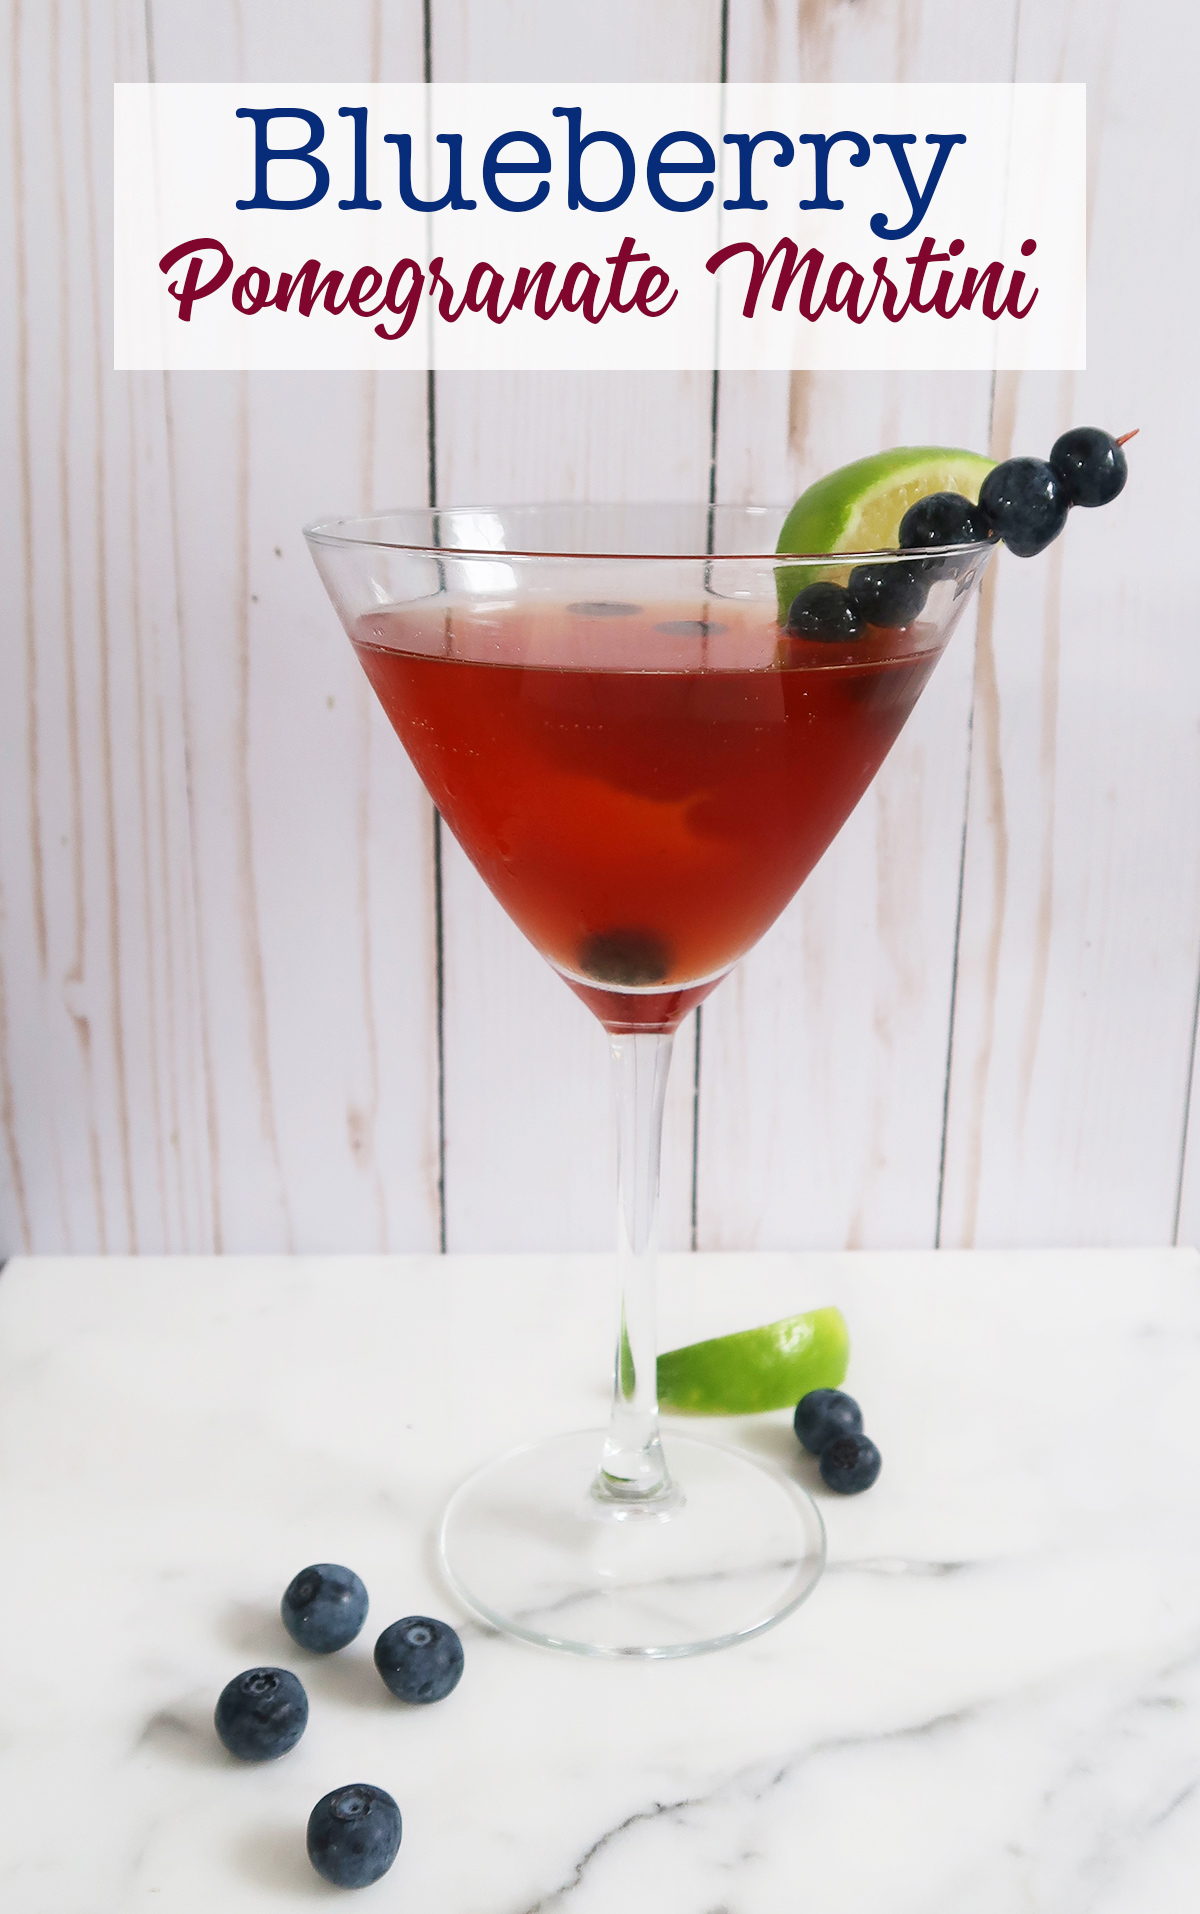 Blueberry_Pomegranate_Martini_1.jpg